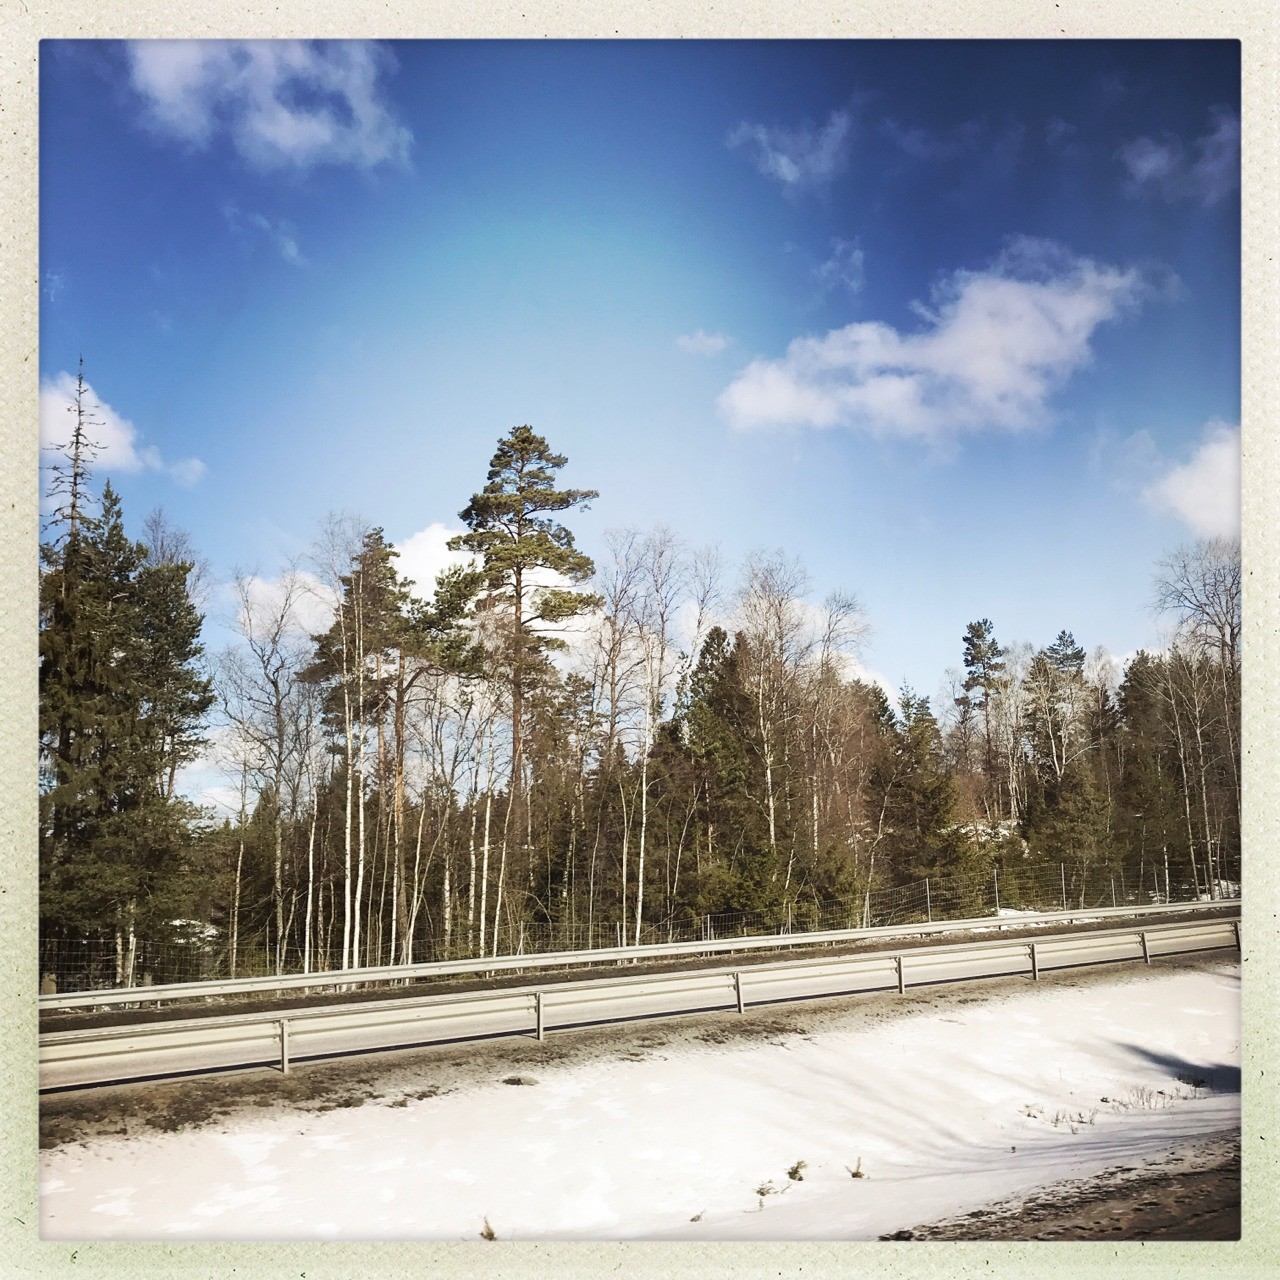 Winter view #stockholm #Sweden 🇸🇪